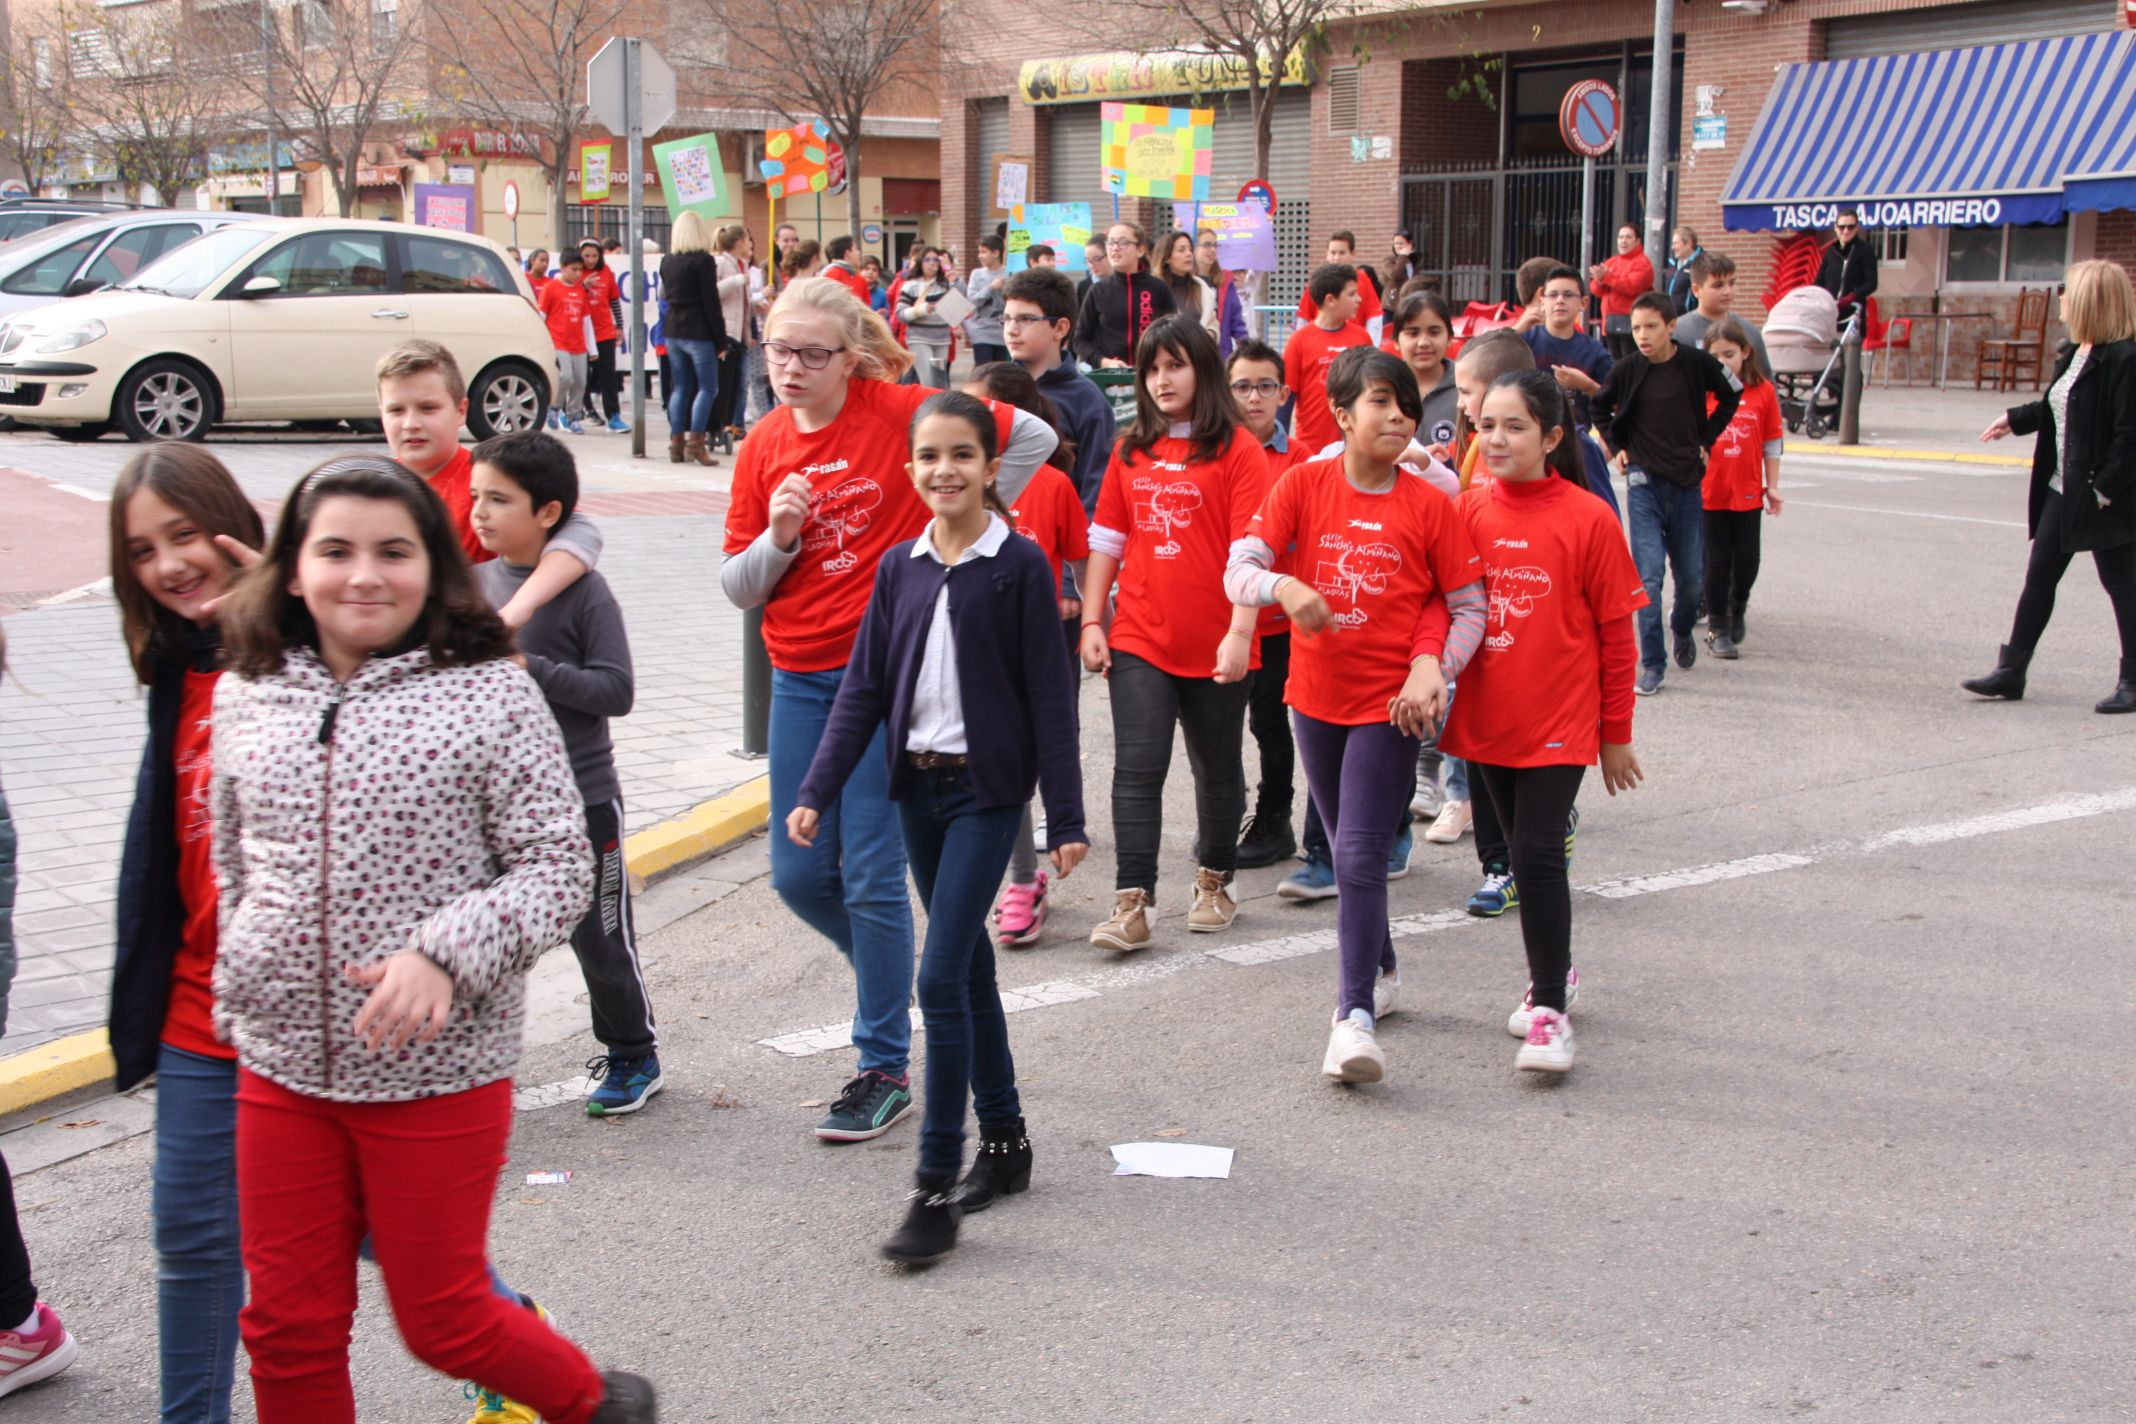 II Marxa Solidaria 2016 (16)